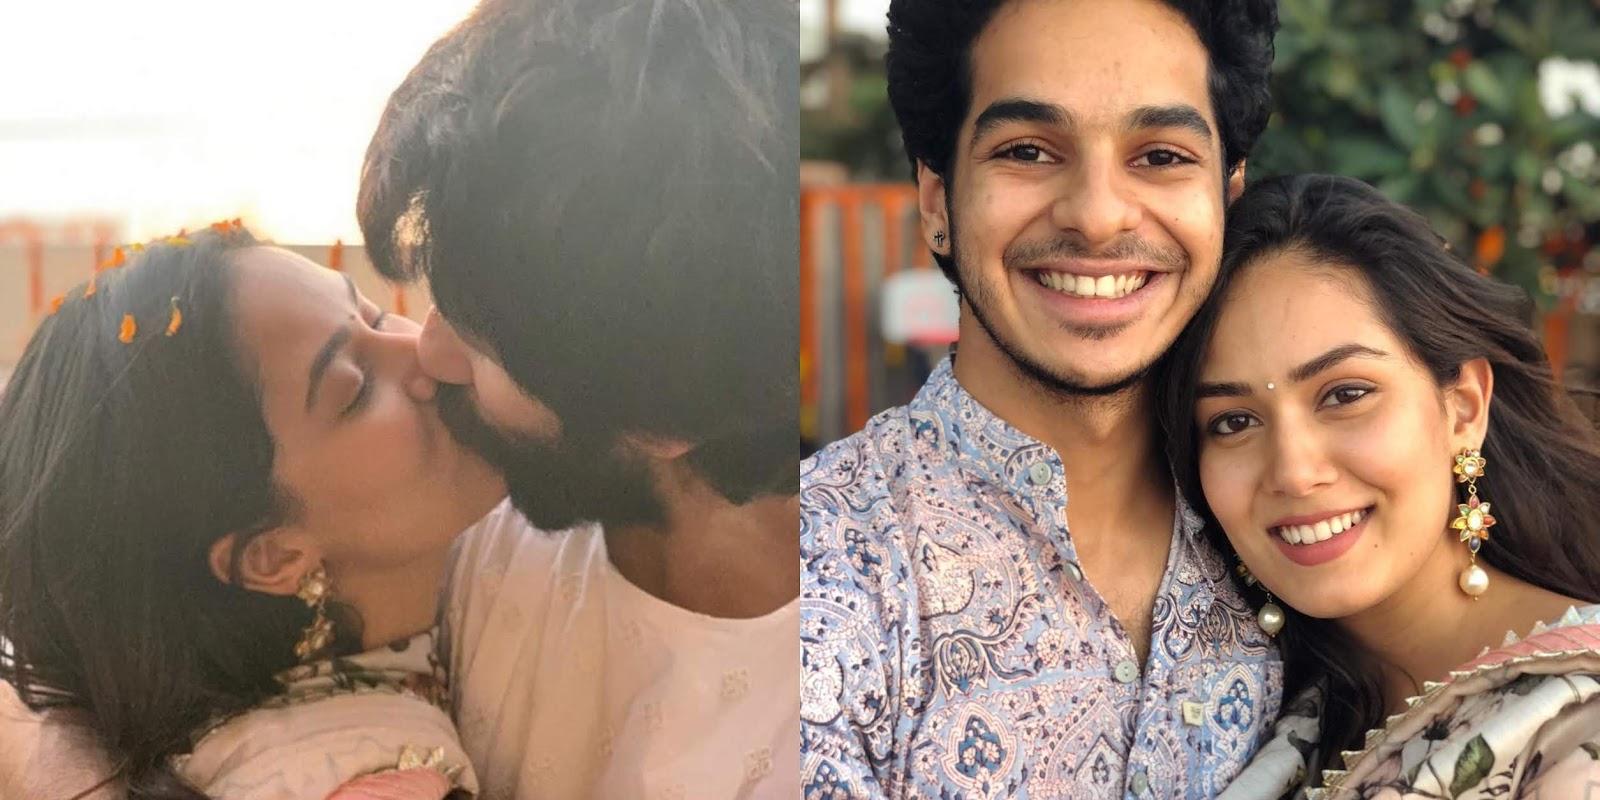 Shahid Kapoor and Mira Rajput share a passionate kiss on Diwali